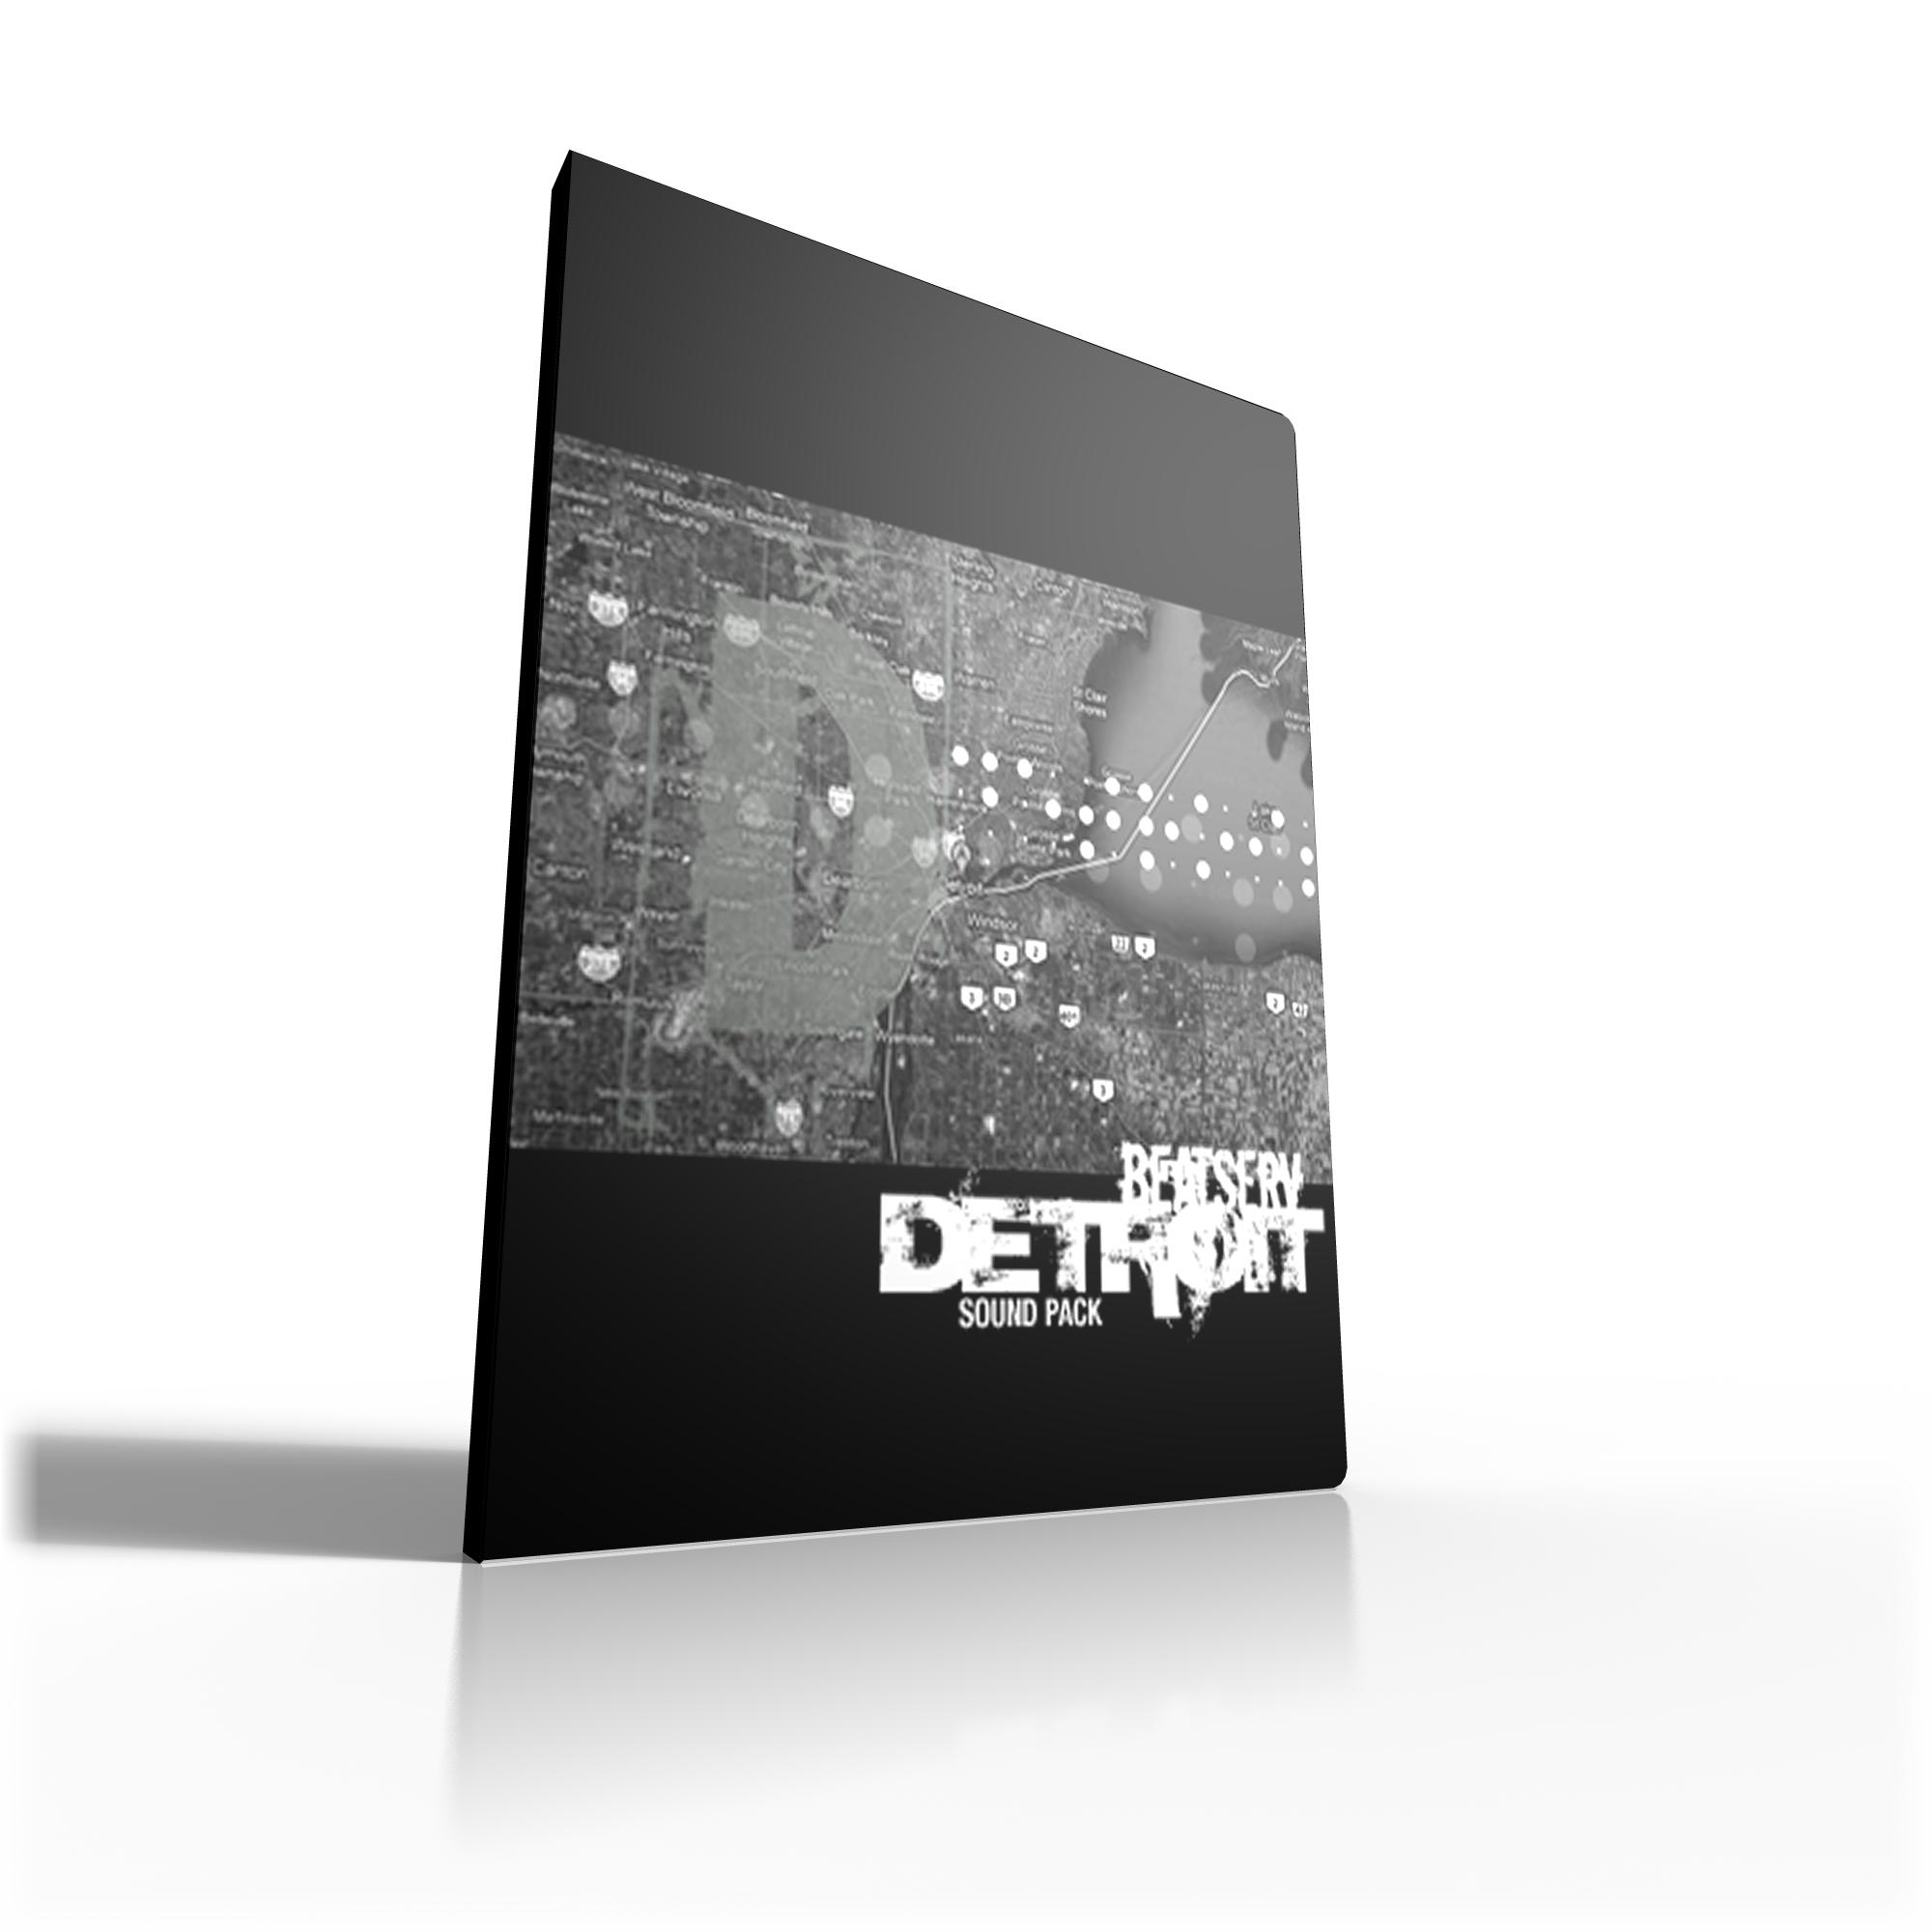 Beatserv: Detroit Sound Pack